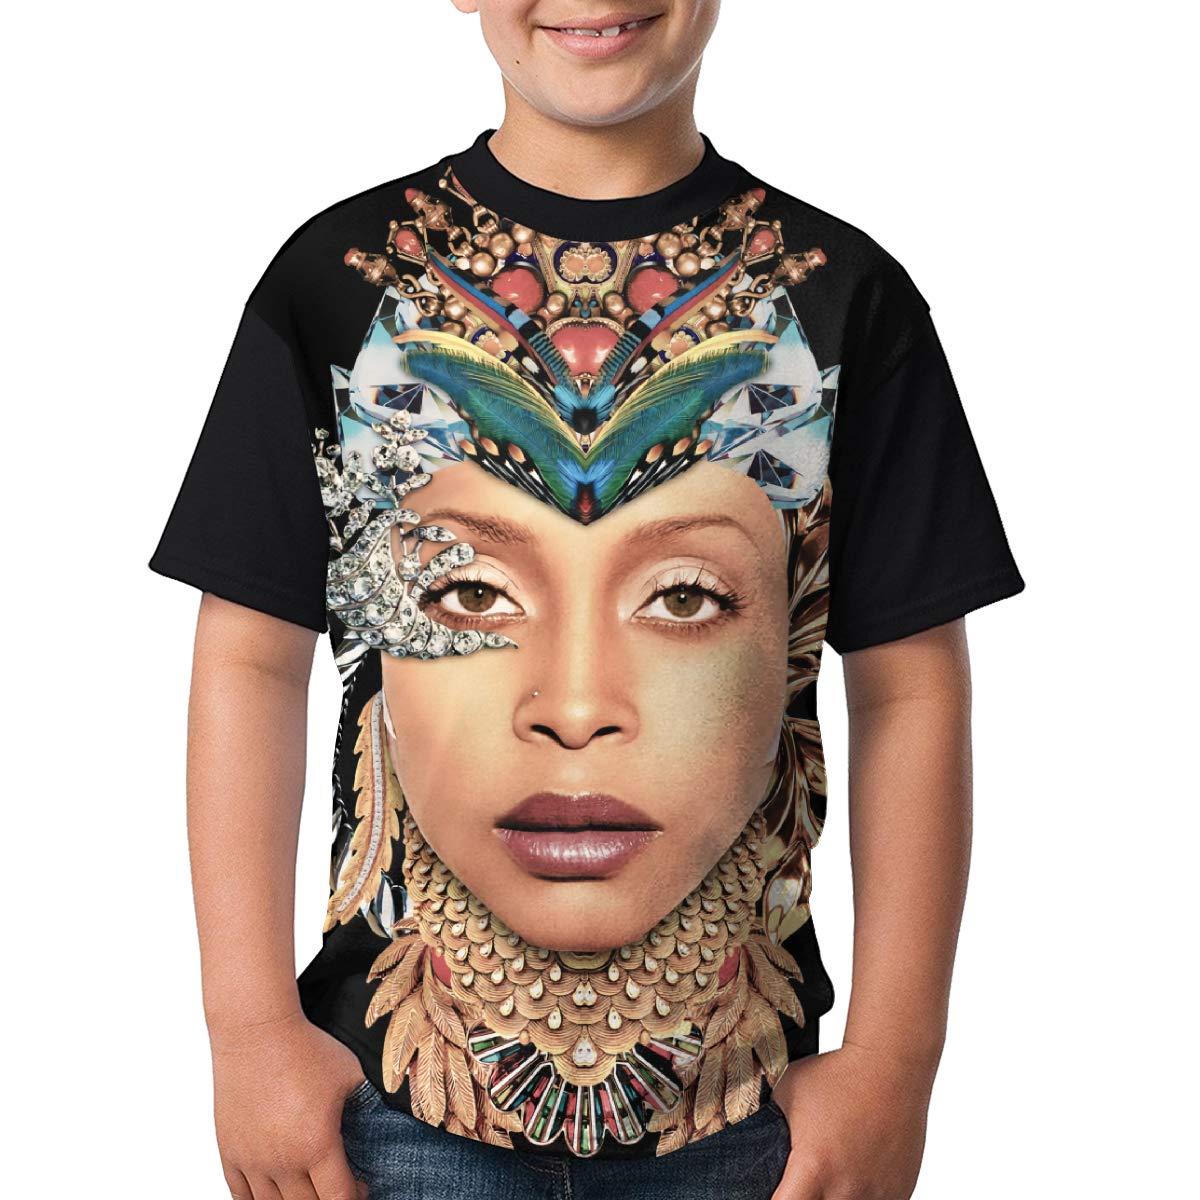 Deborah E Freeman Erykah Badu T Shirts Youth Round Neck Shirt Teenager Boys Personality Tees